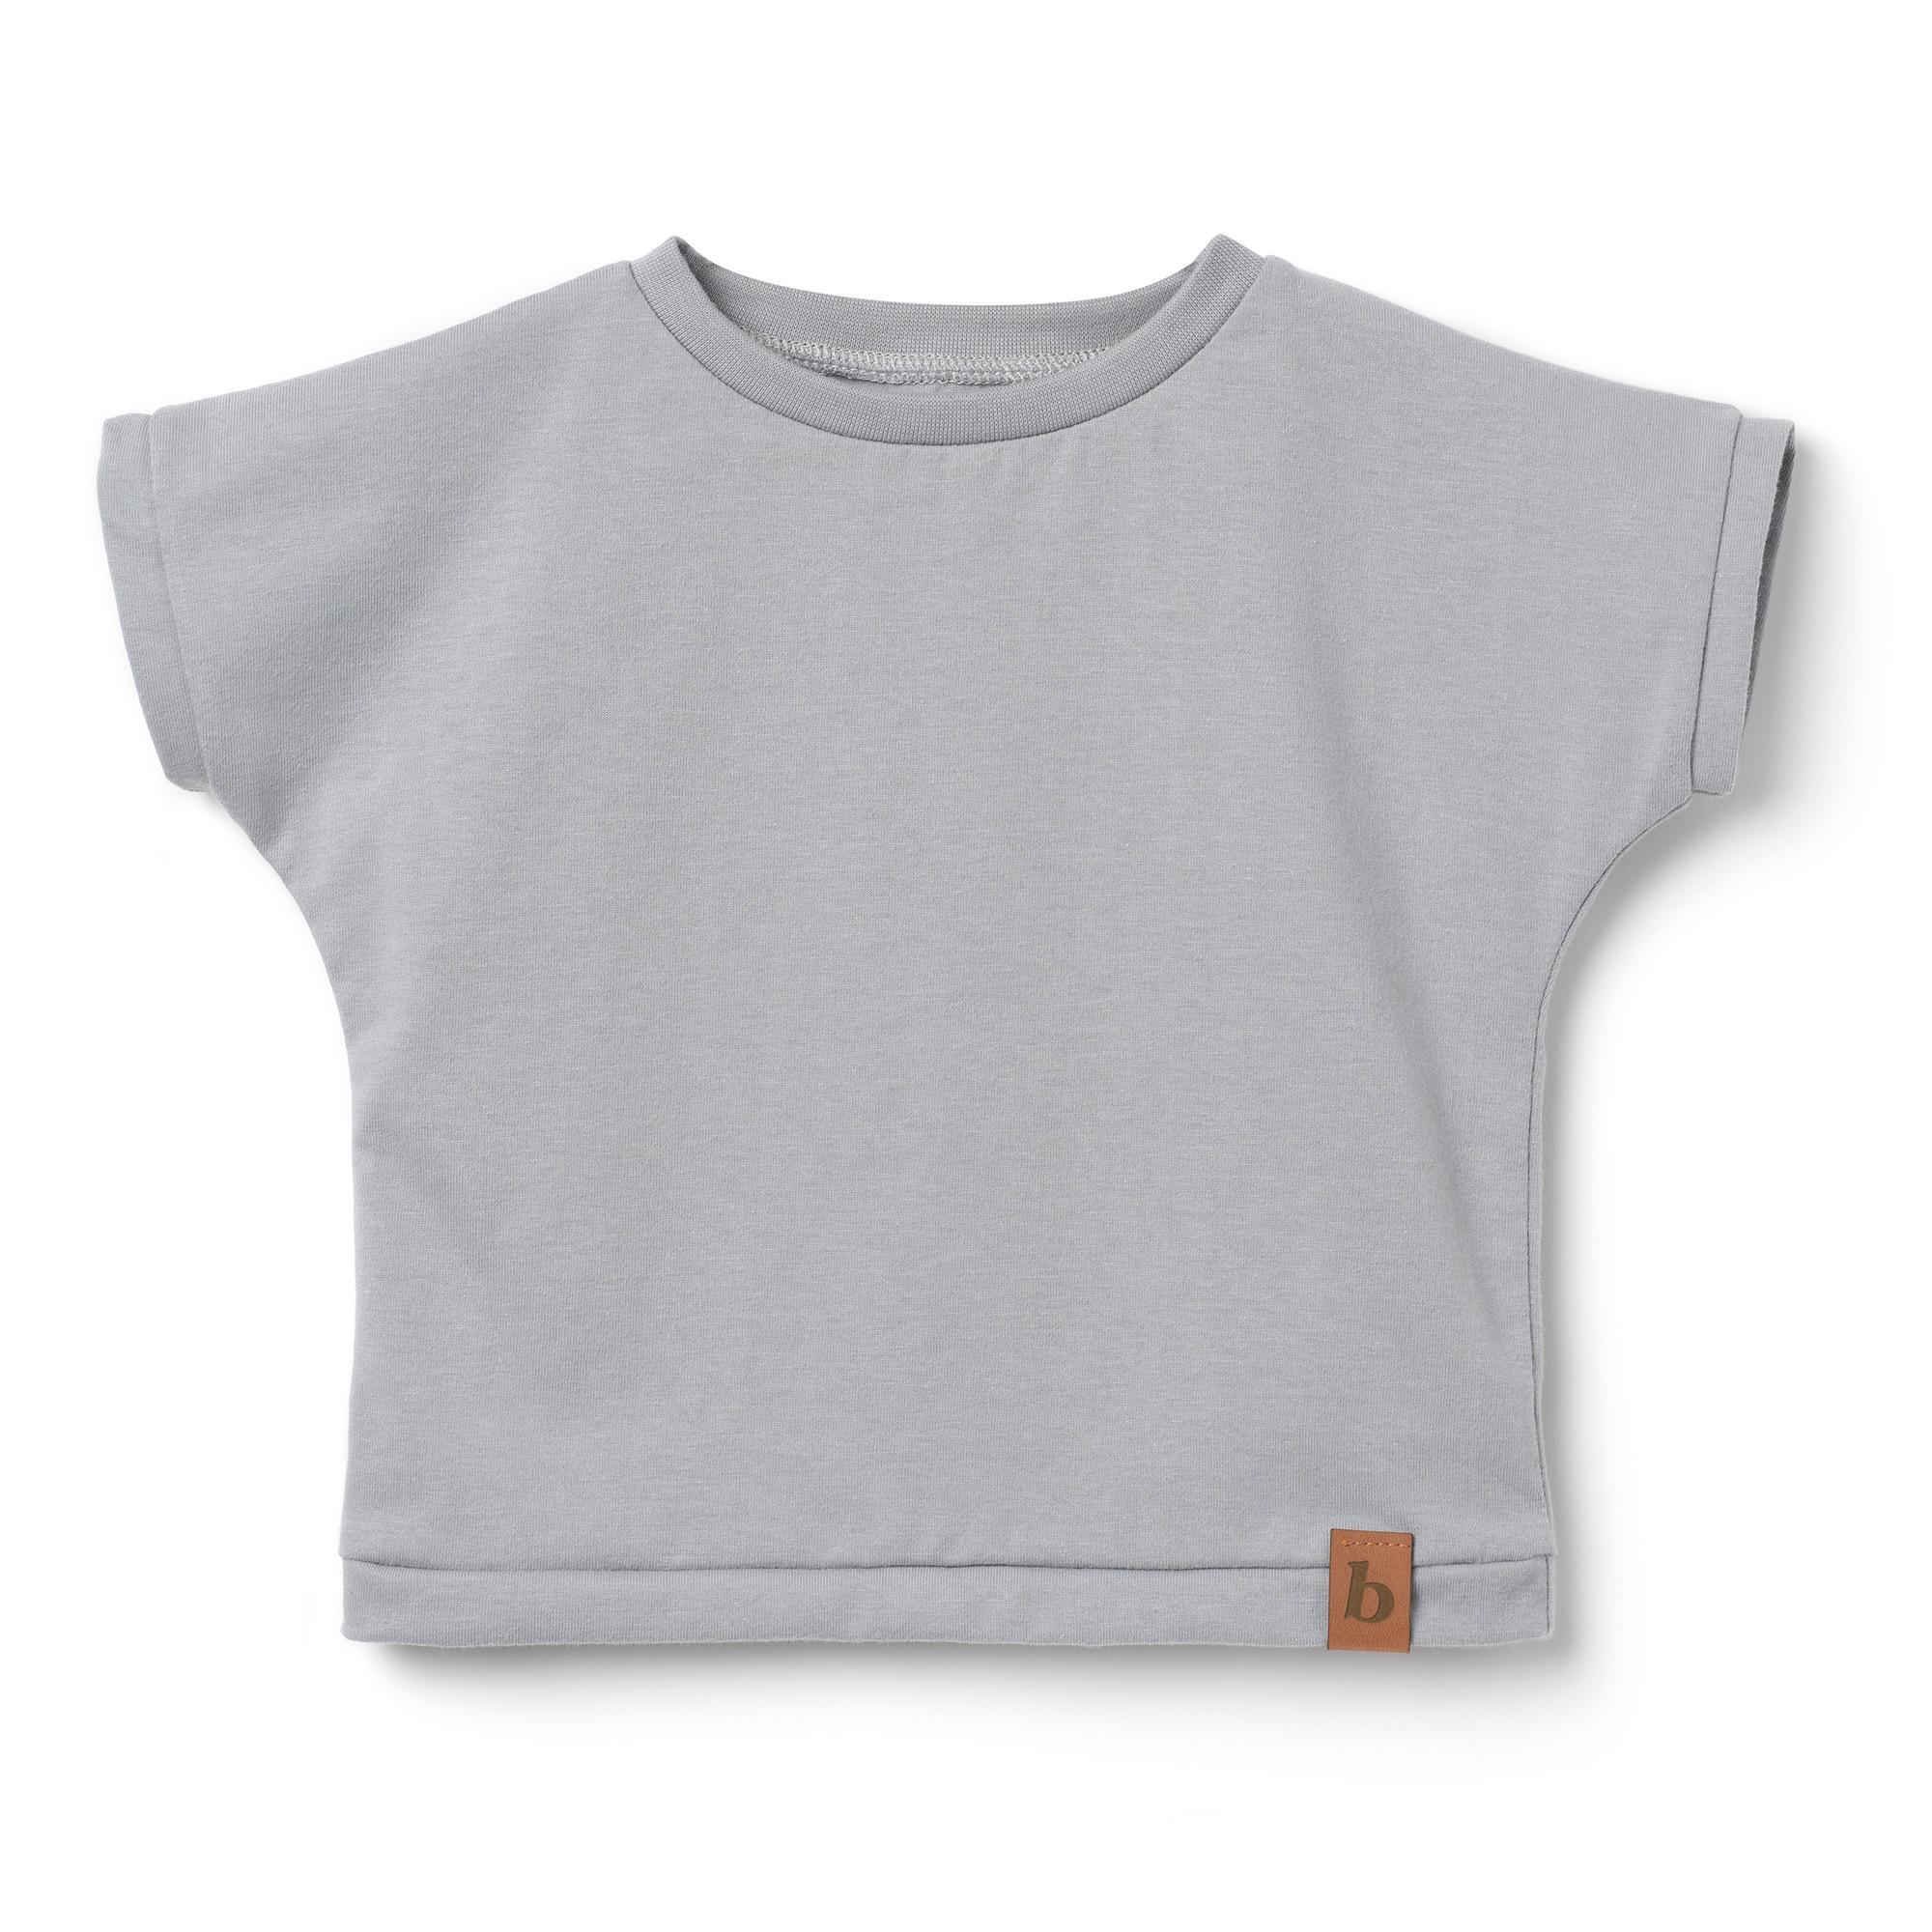 Koszulka dziecięca- szara - Bubalove